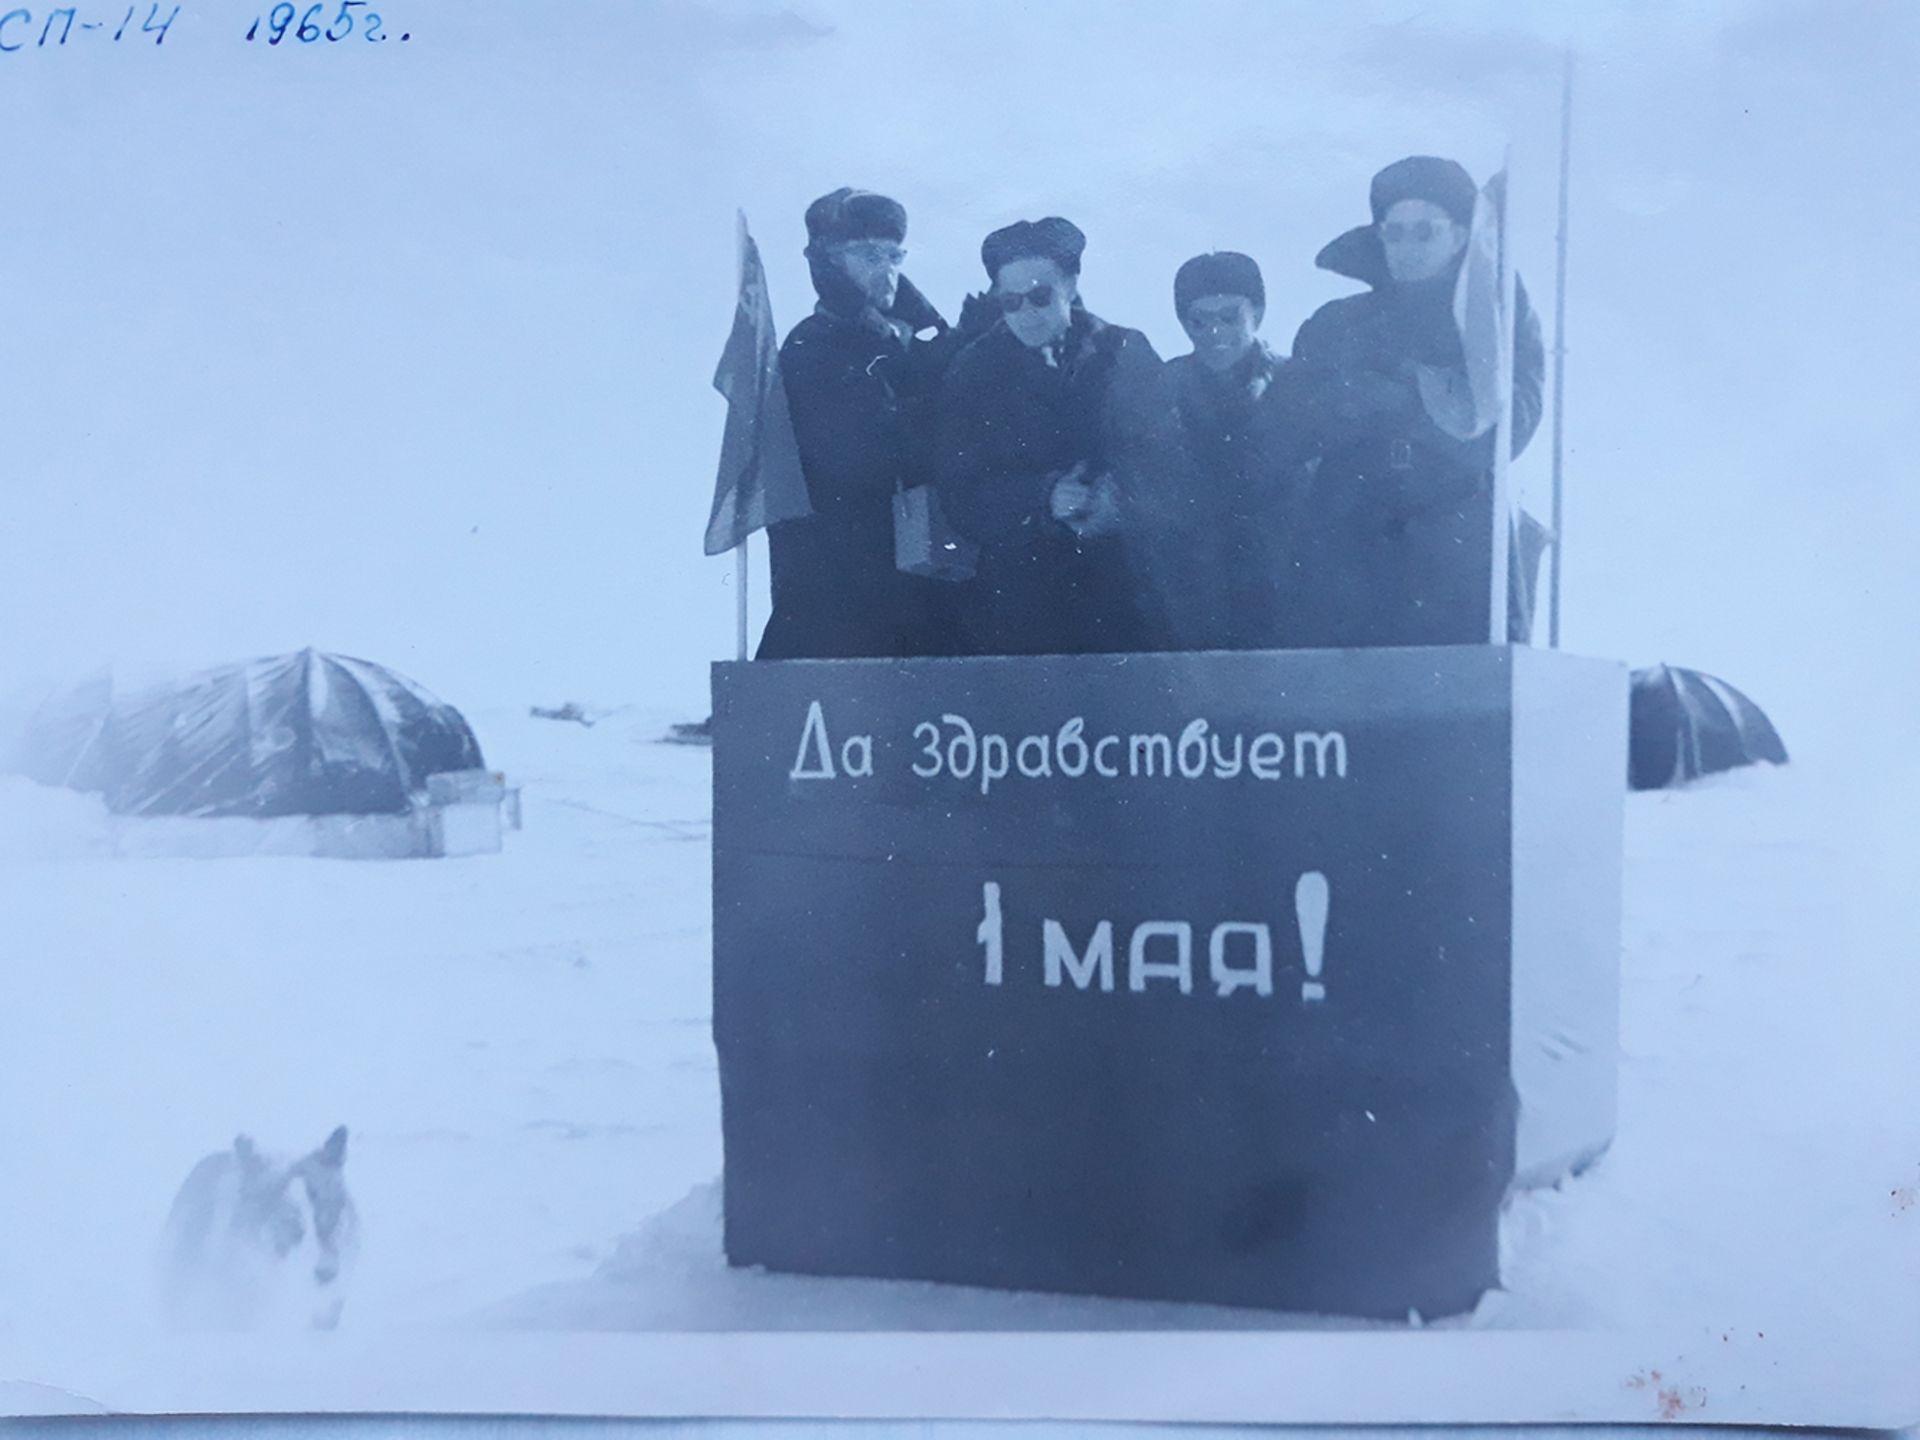 [Soviet]. Northern pole. Station SP-14. May 1st, 1965. Photograph. <br>